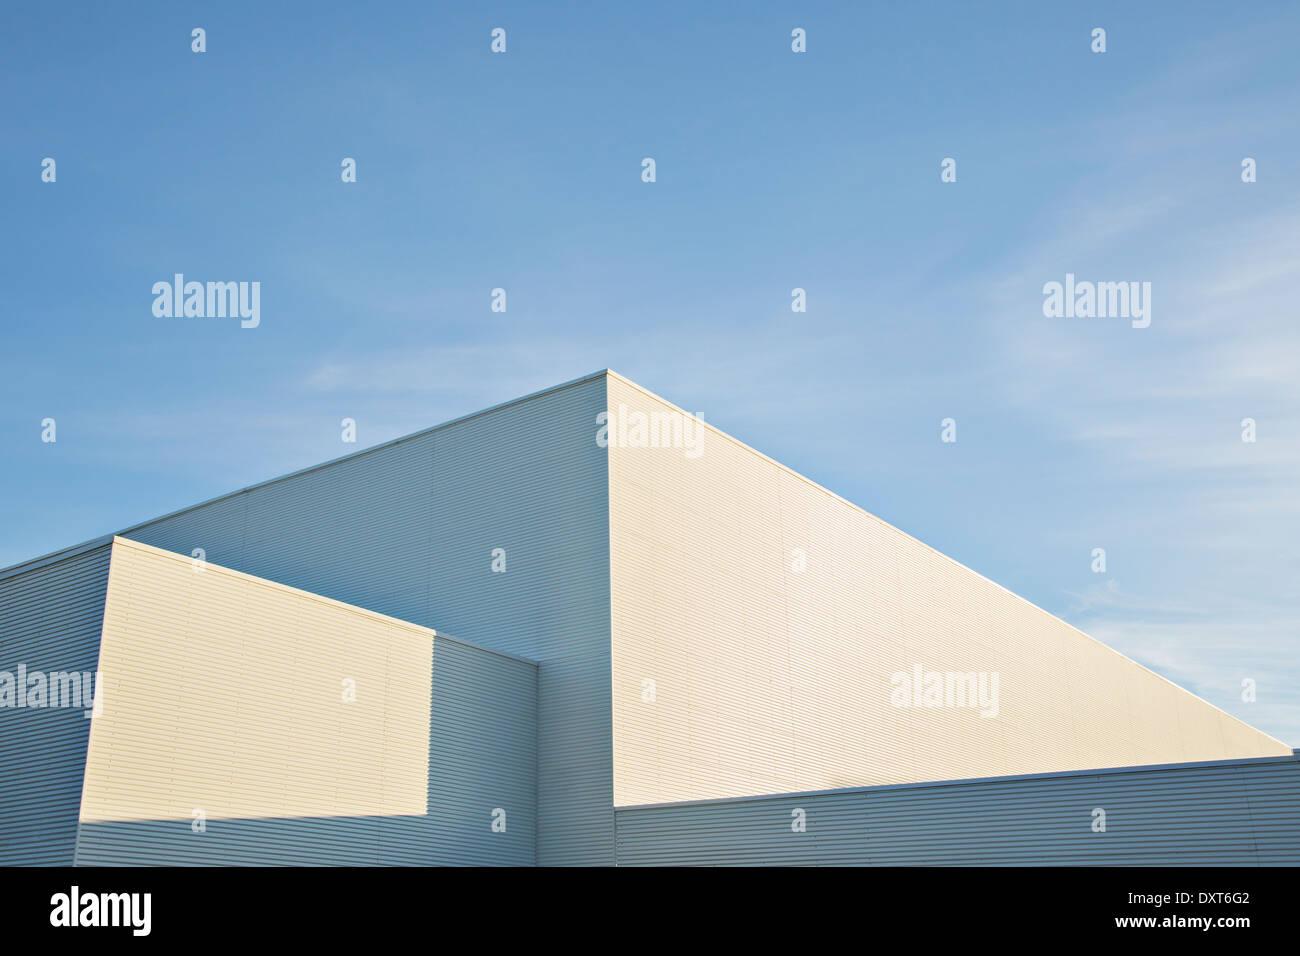 Sun shining on buildings against blue sky - Stock Image